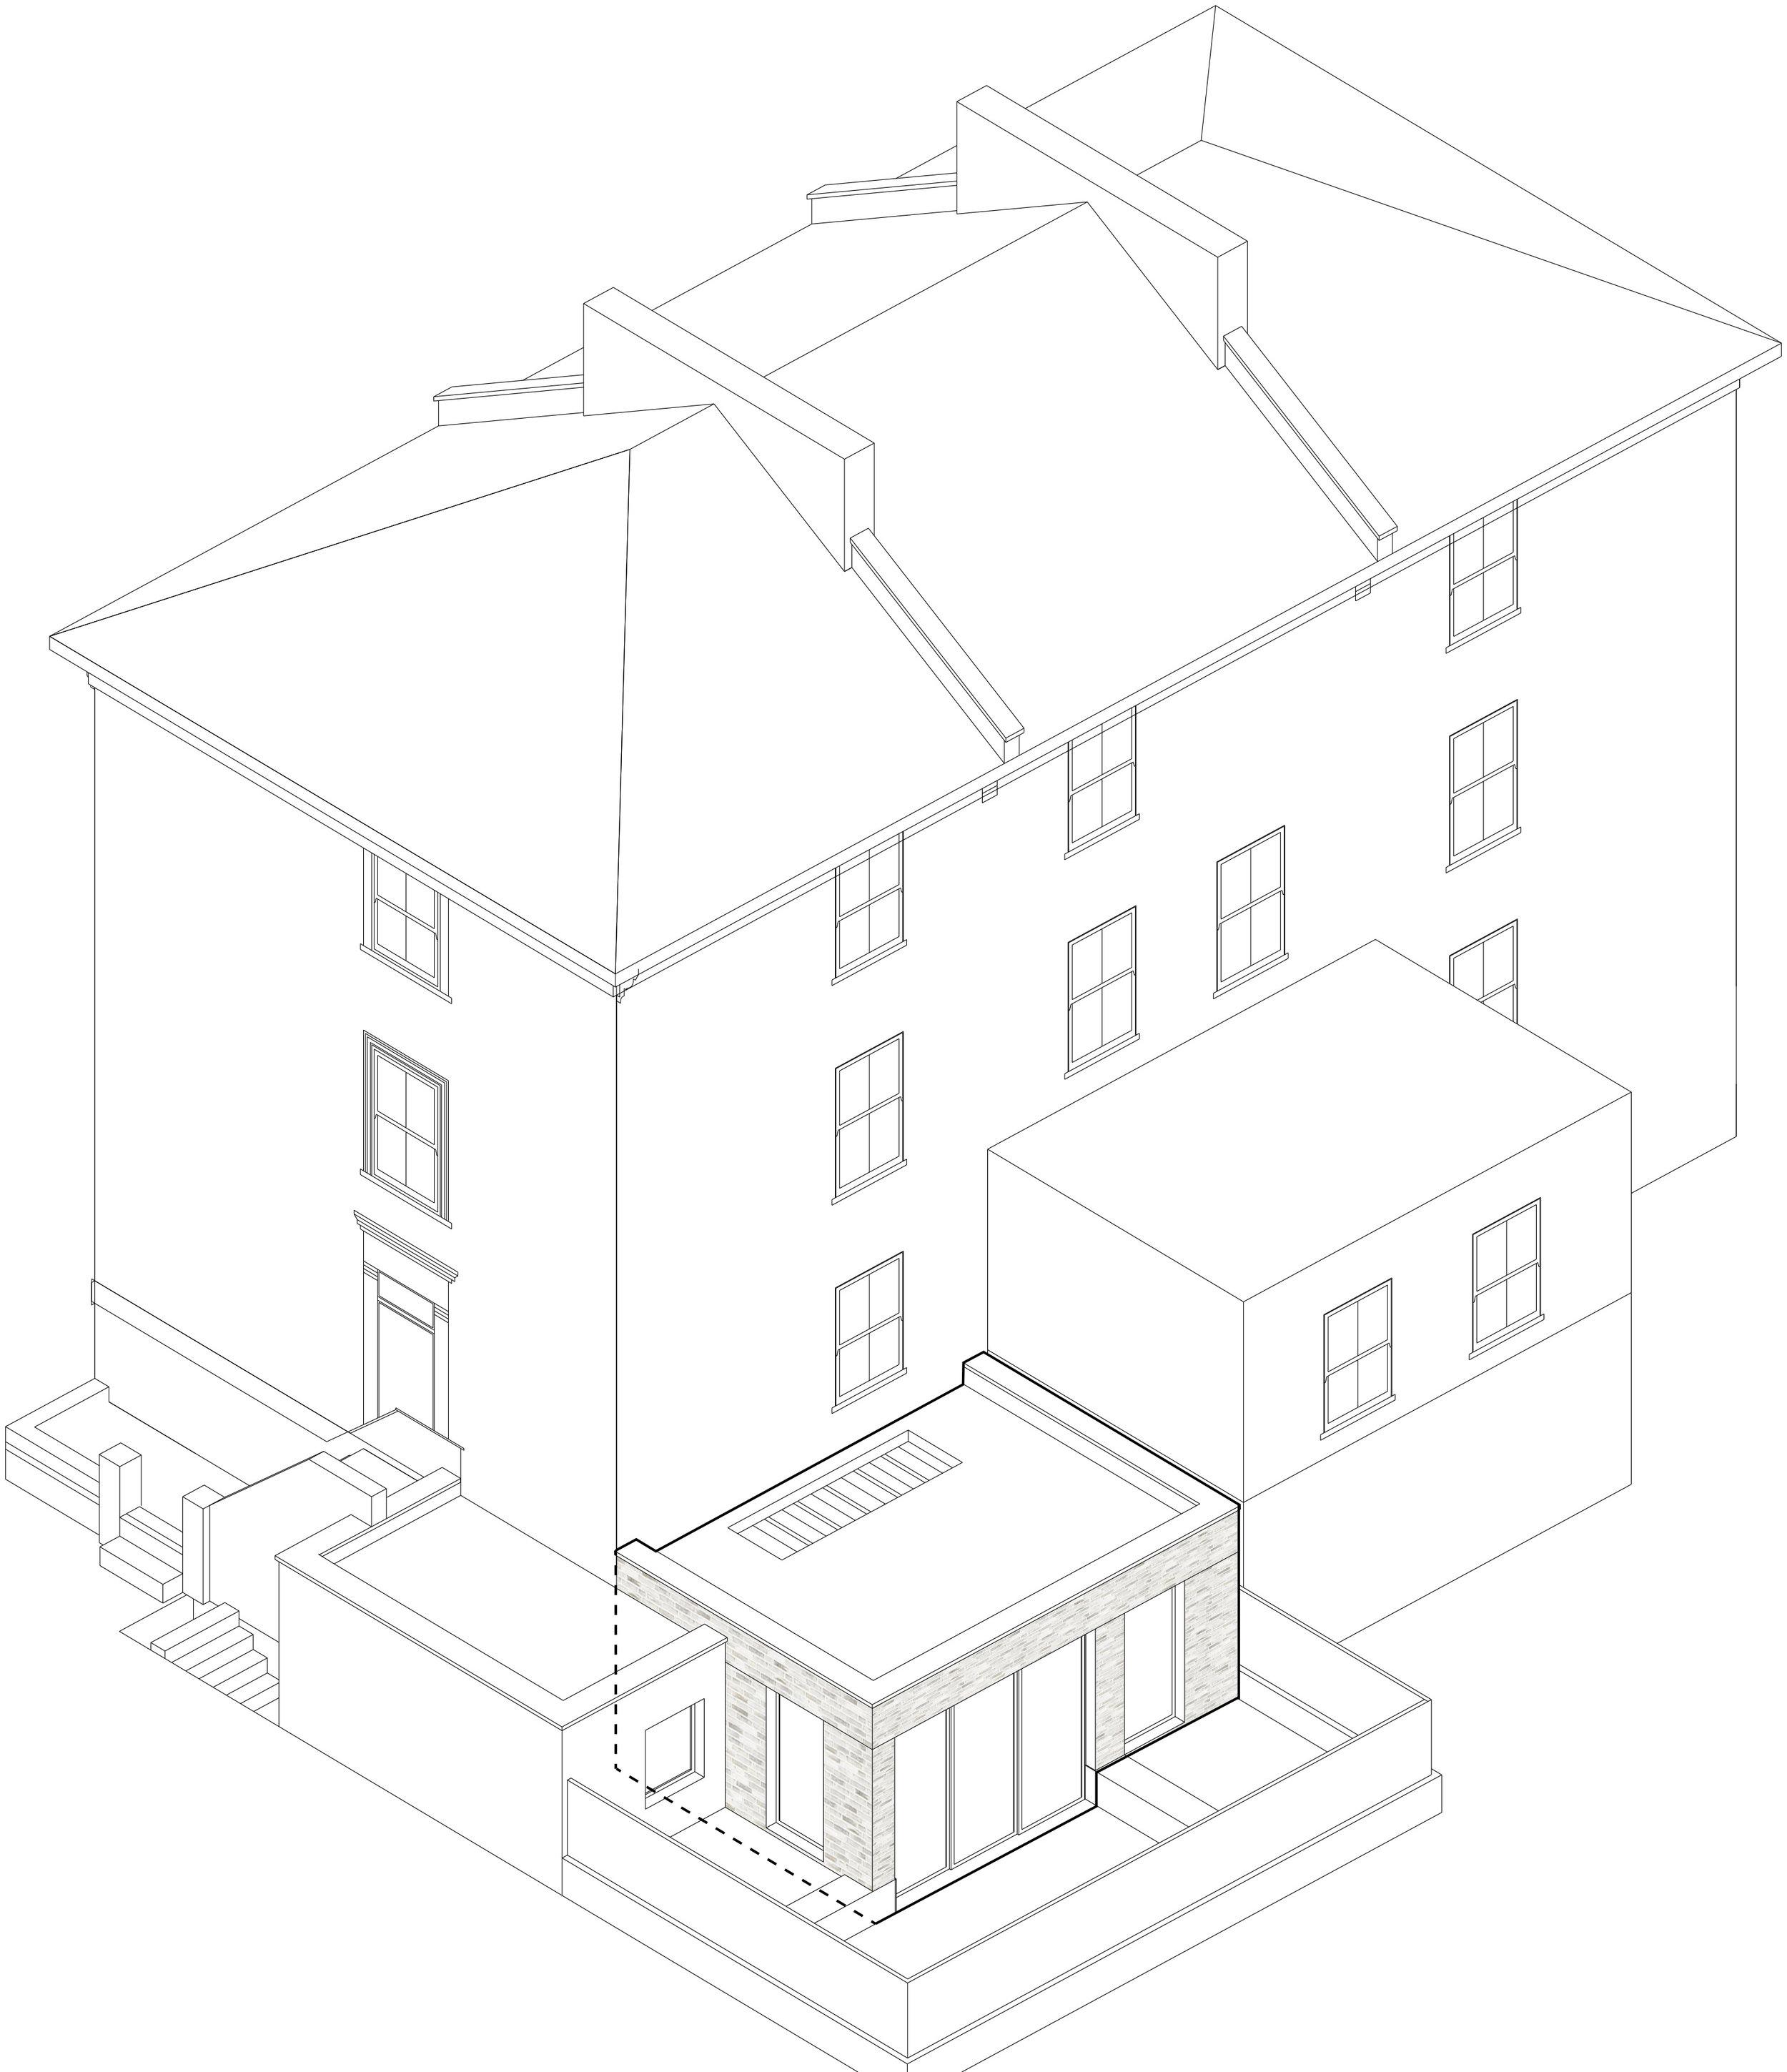 UpdatedLayoutModel - Pale Brick - Axo.jpg